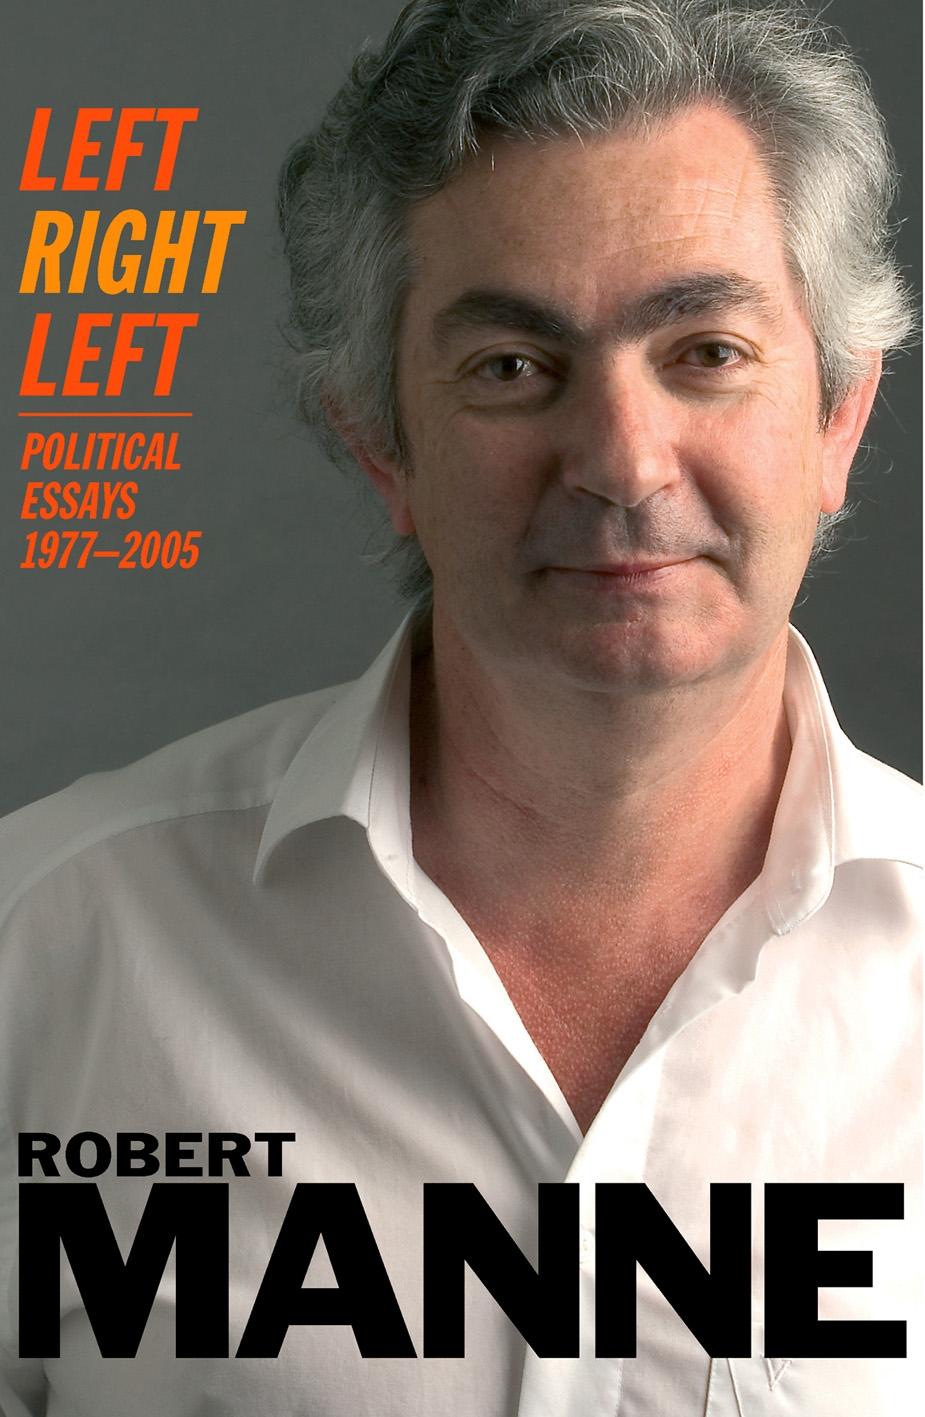 left right left political essays